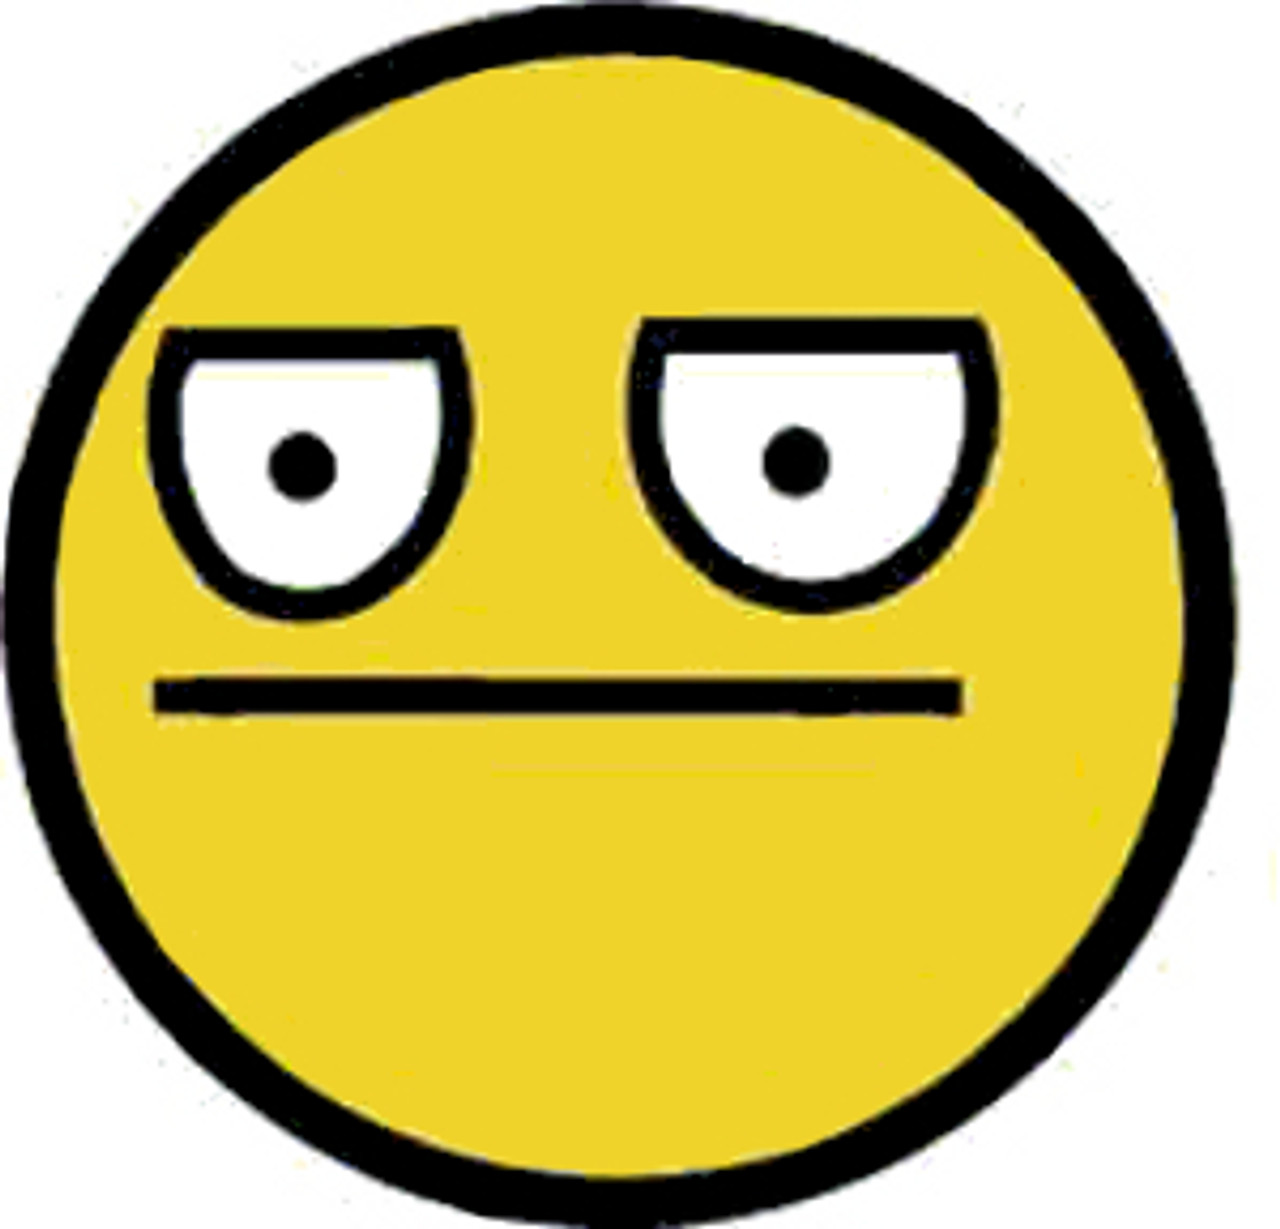 Unamused face decal 88183 1464722407 jpgc2imbypasson